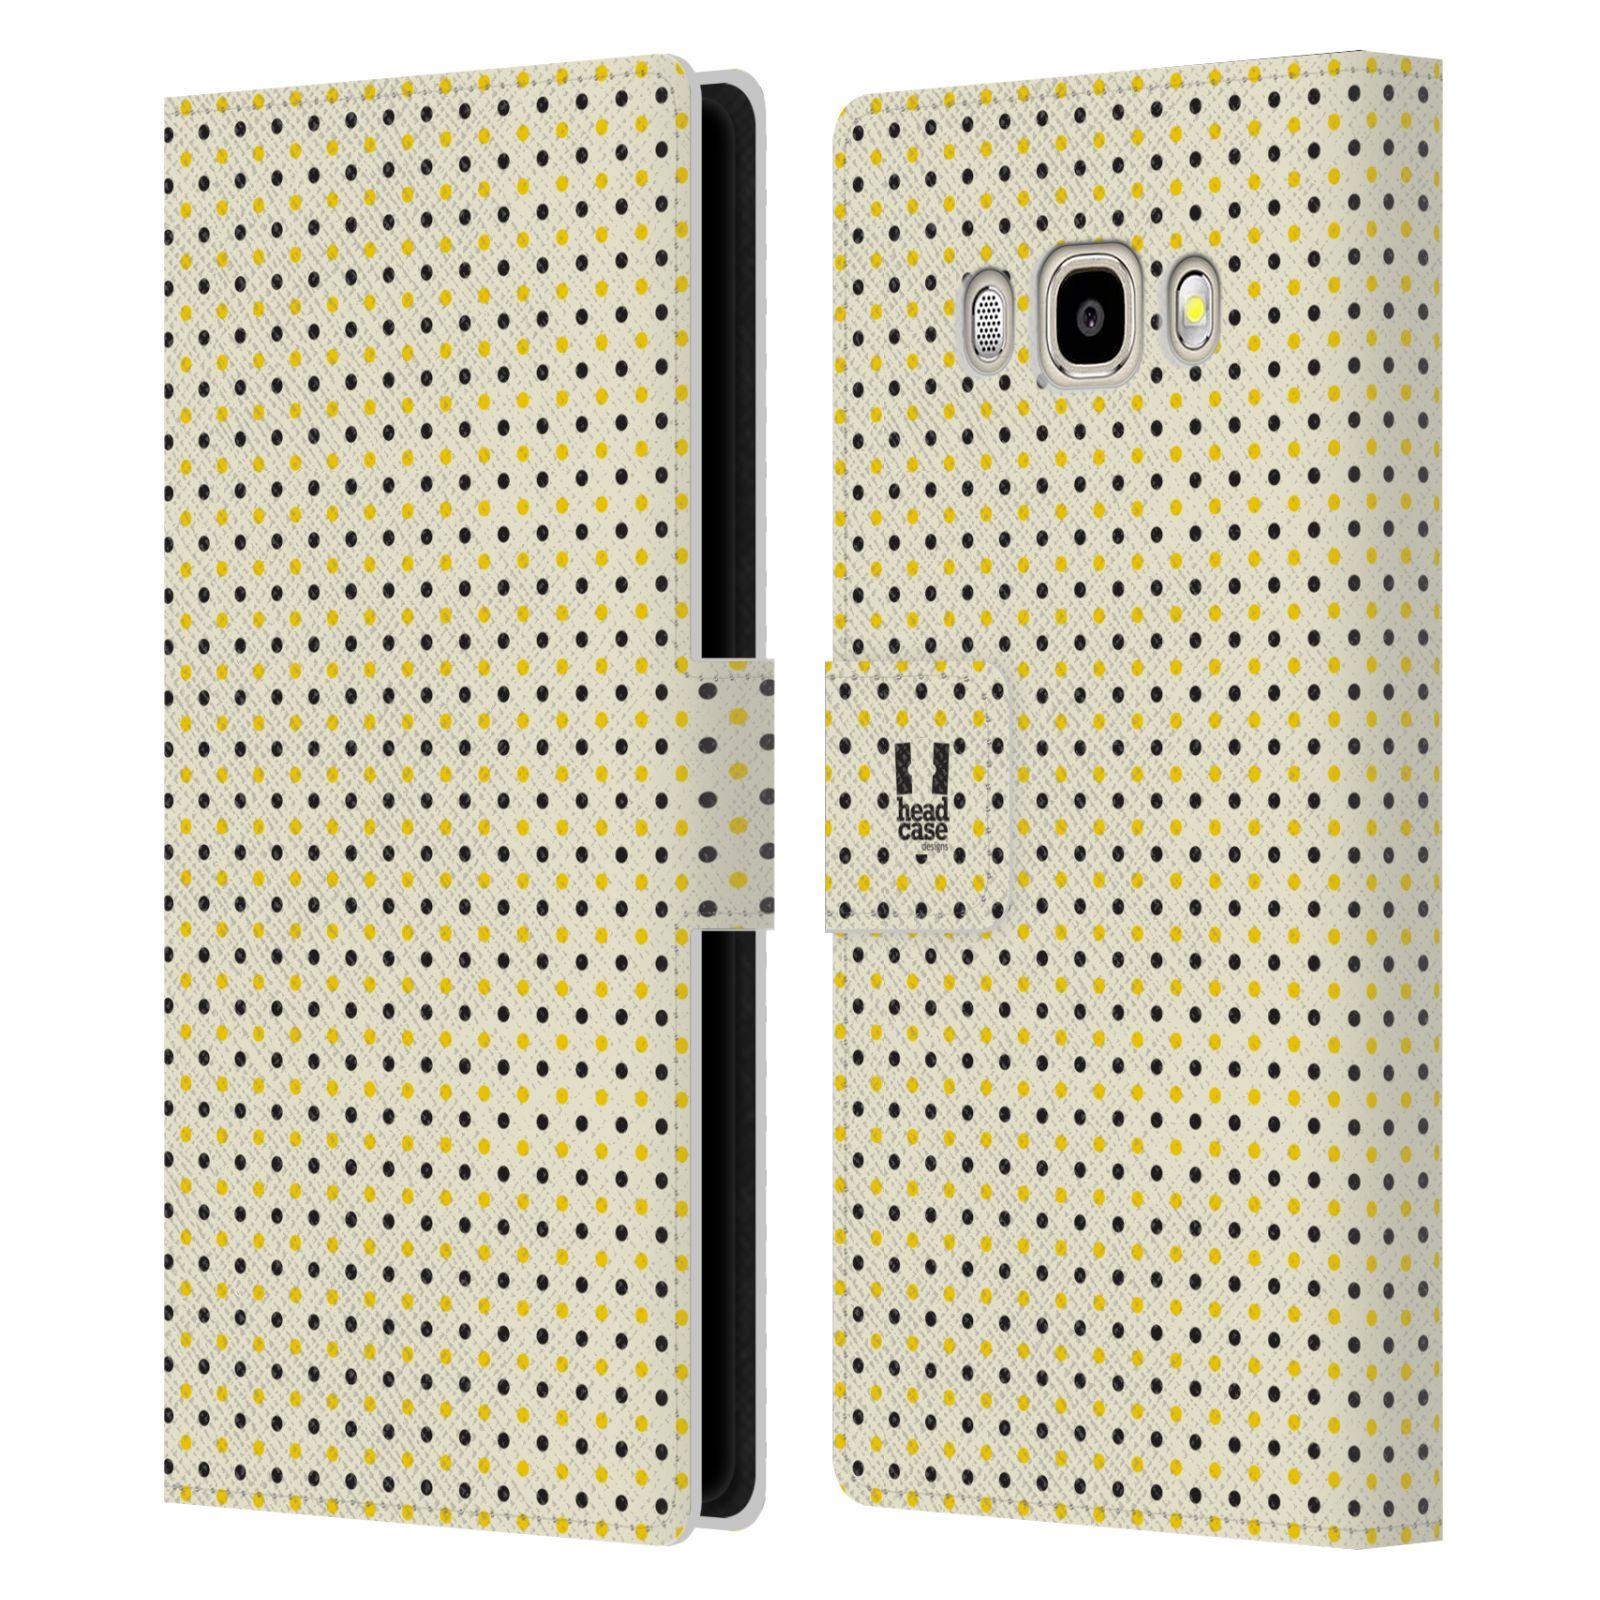 HEAD CASE Flipové pouzdro pro mobil Samsung Galaxy J5 2016 VČELÍ VZOR tečky a puntíky